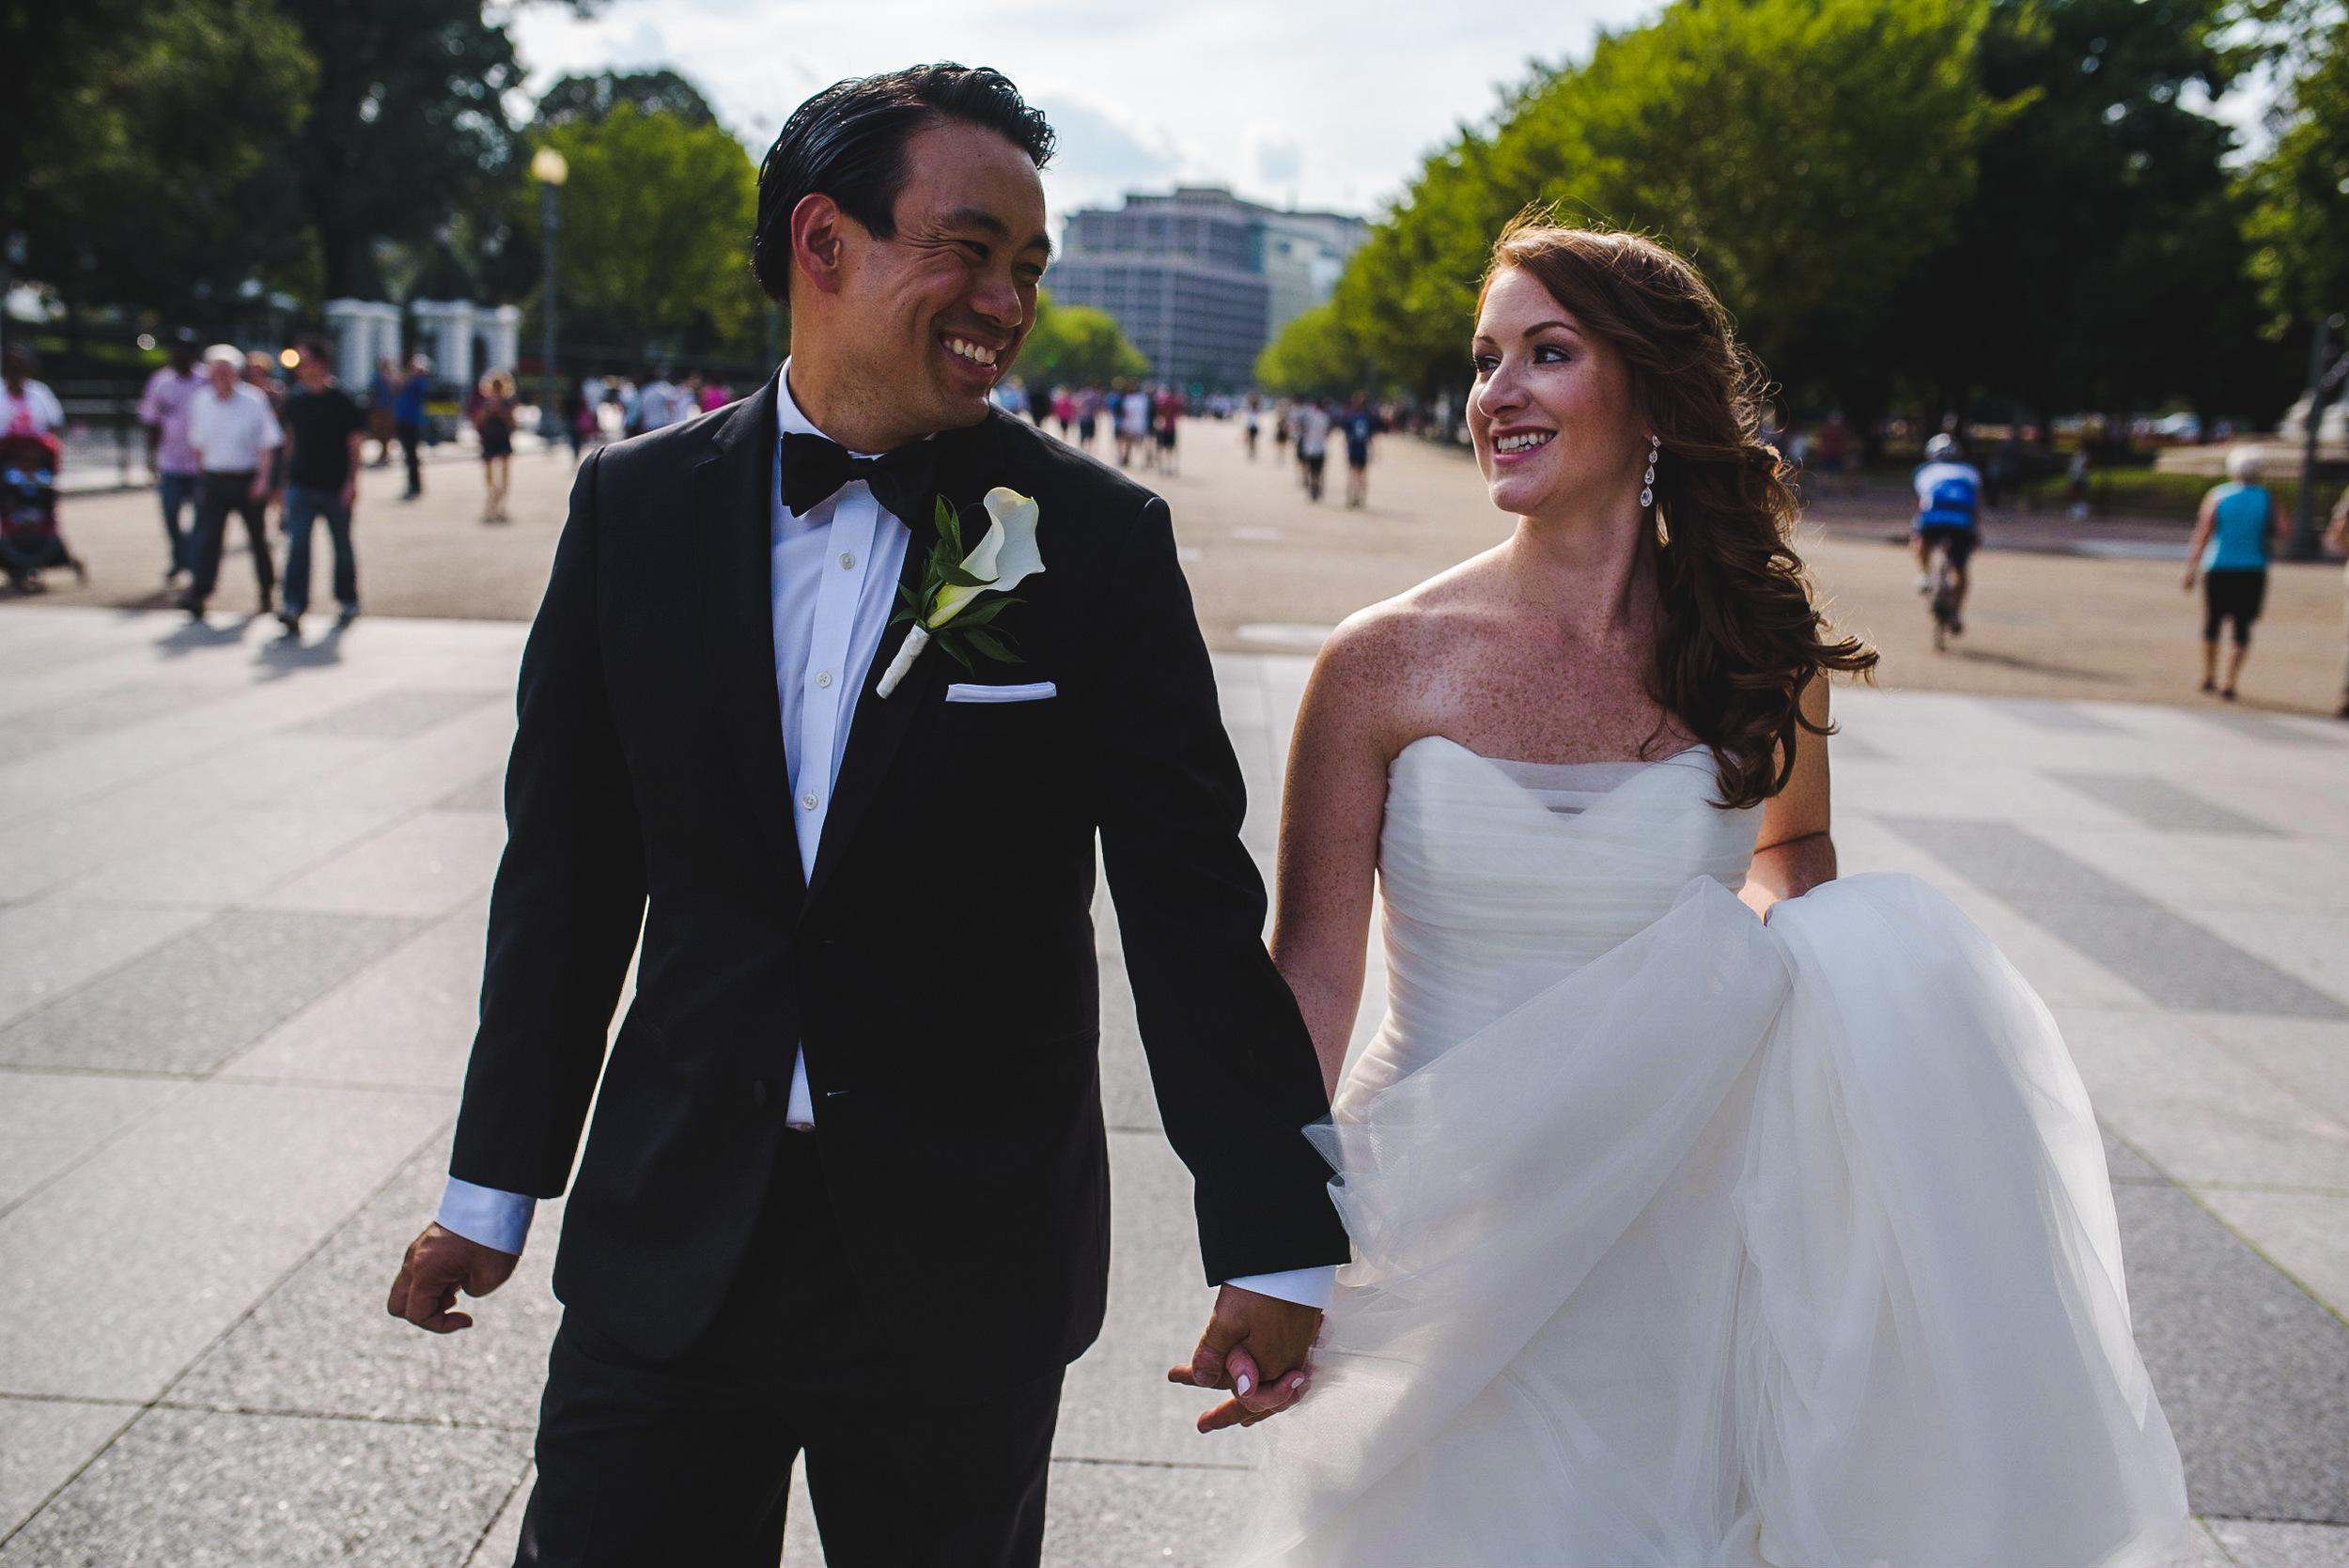 Wedding at W Hotel Washington DC by Mantas Kubilinskas-8.jpg